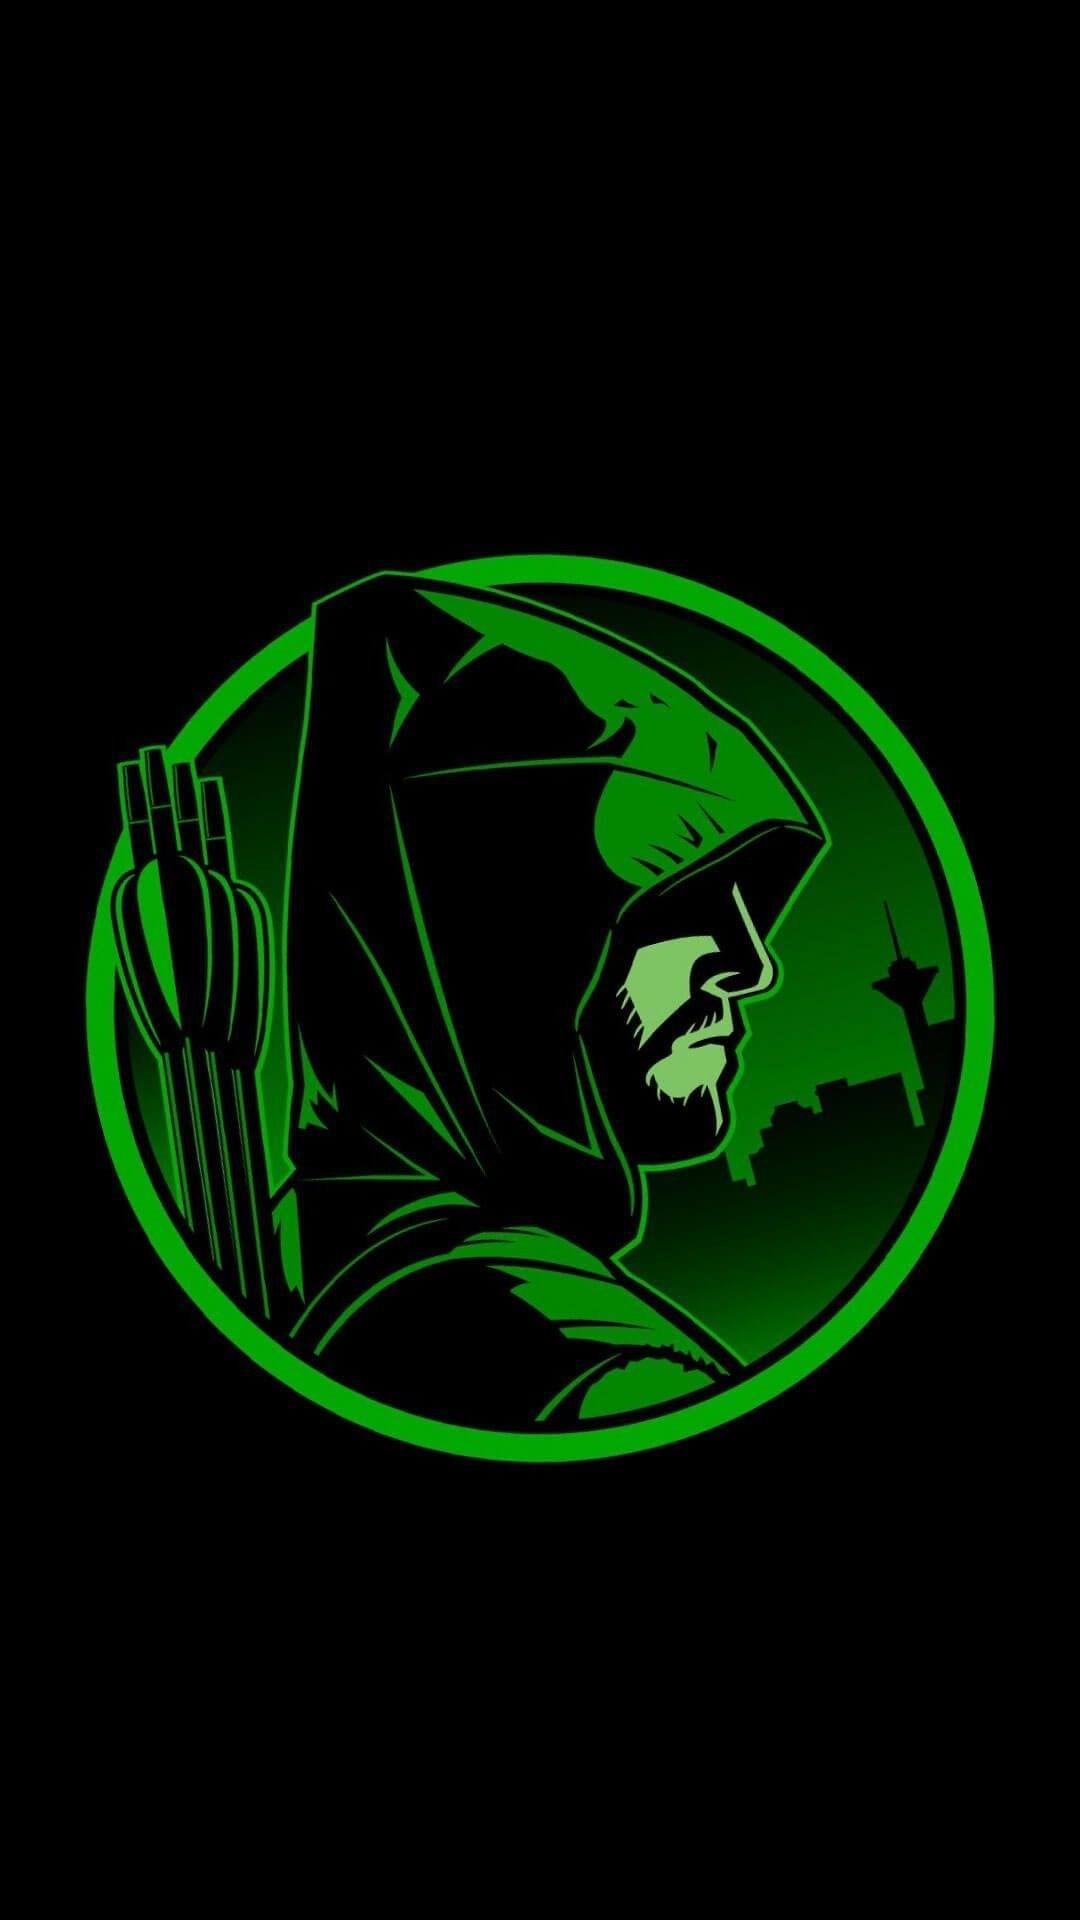 Green Arrow iPhone 6 wallpaper